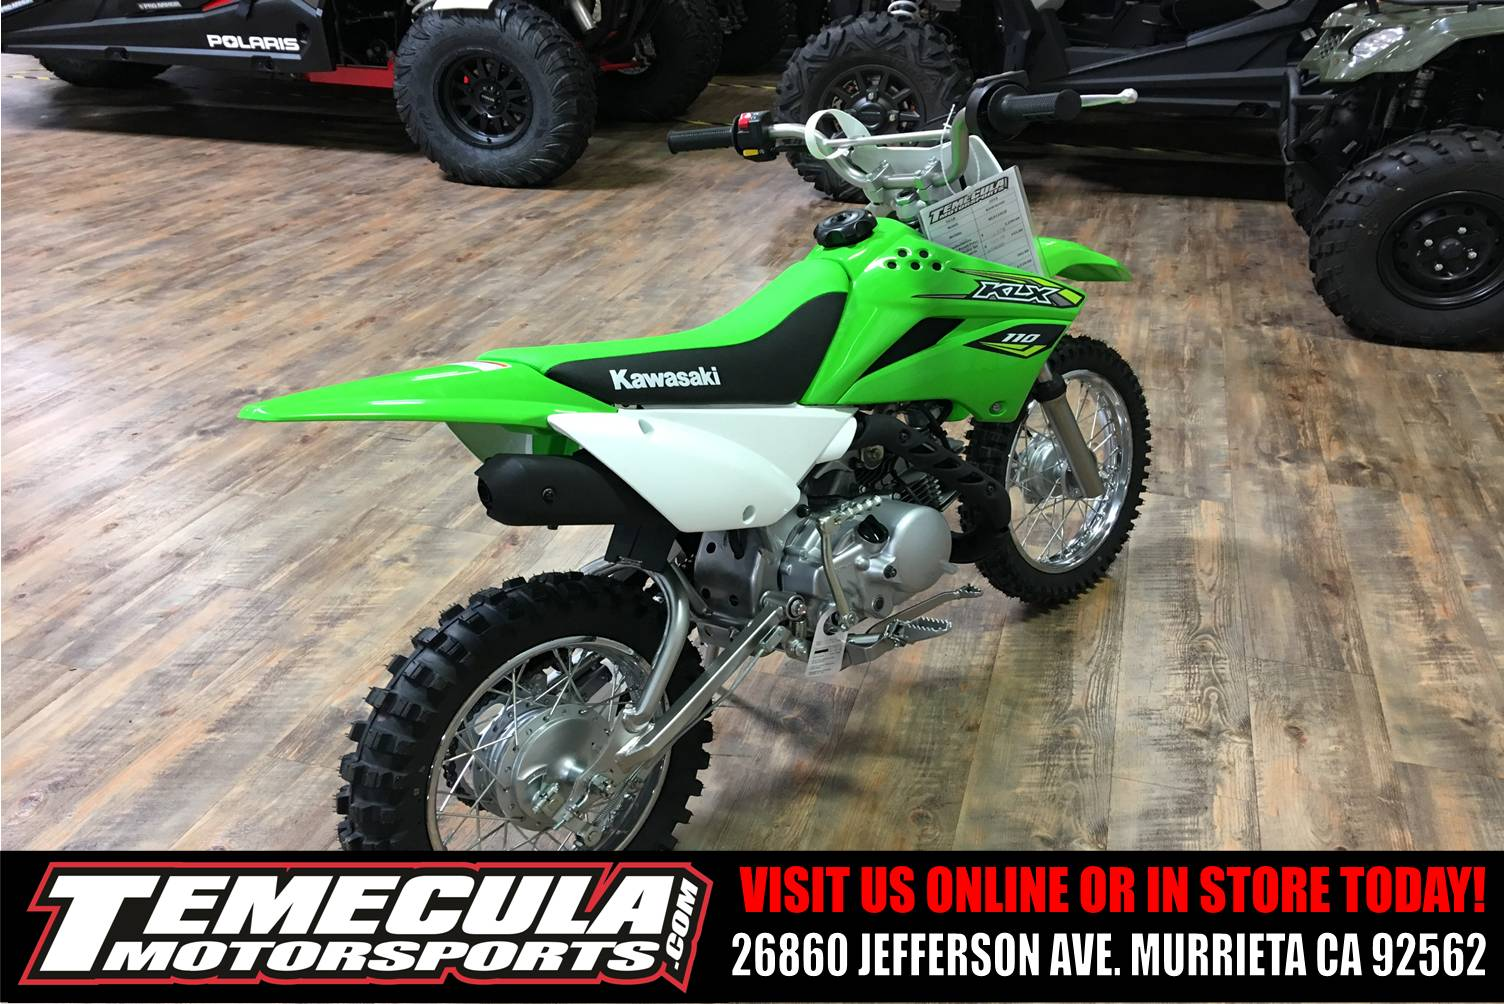 New 2018 Kawasaki KLX 110 Motorcycles in Murrieta, CA | Stock Number ...